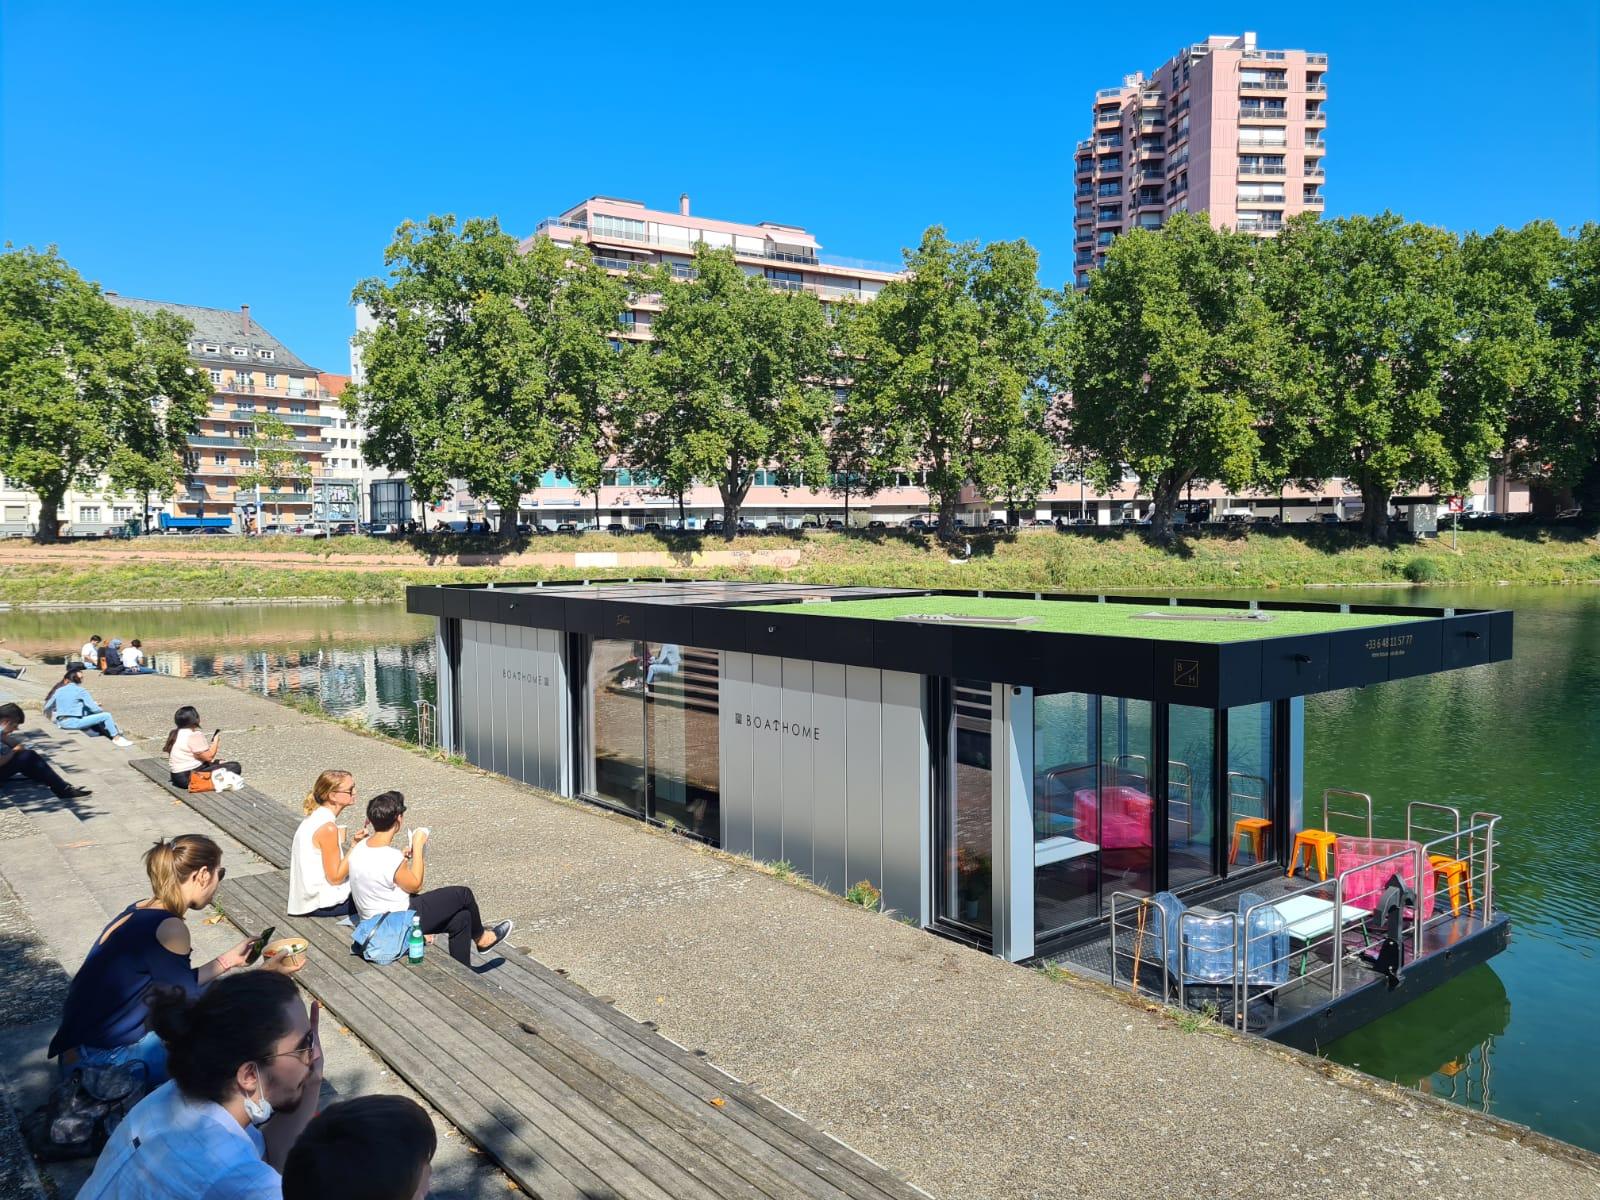 Hausboot kaufen - Hausboot Liegeplatz